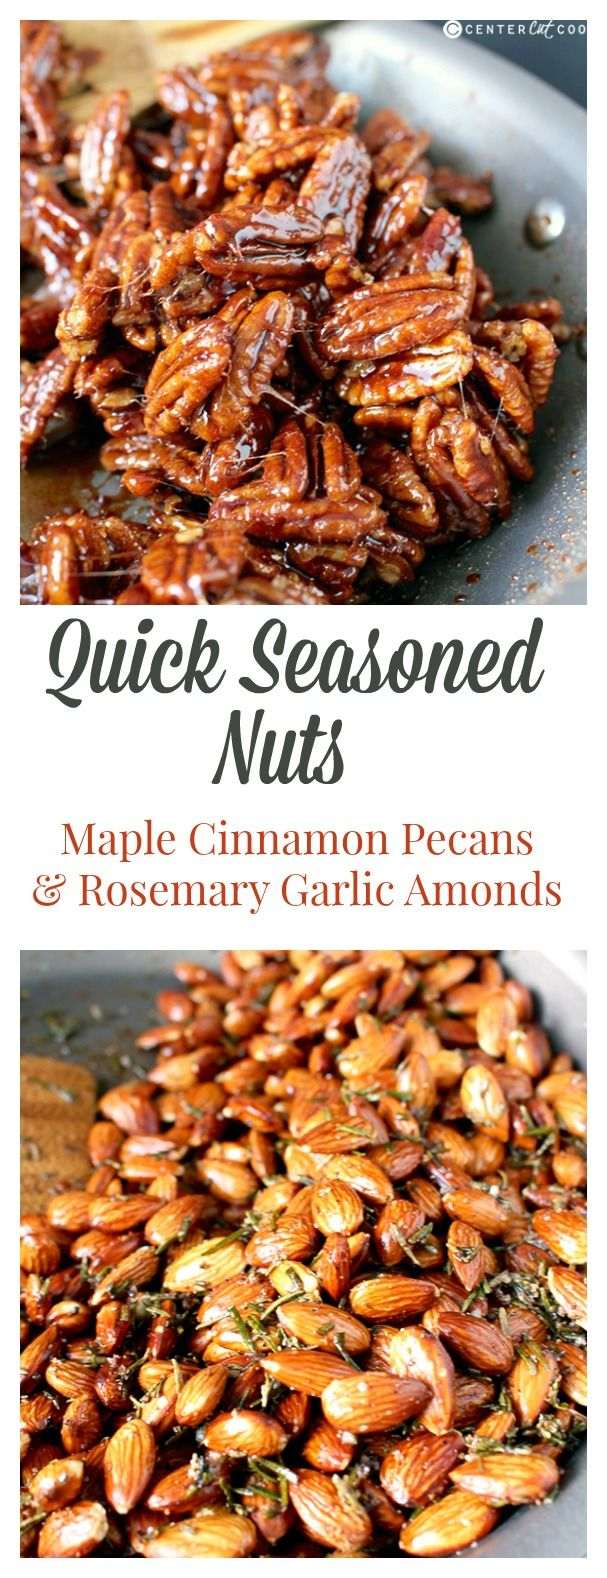 Quick Seasoned Nuts Recipe